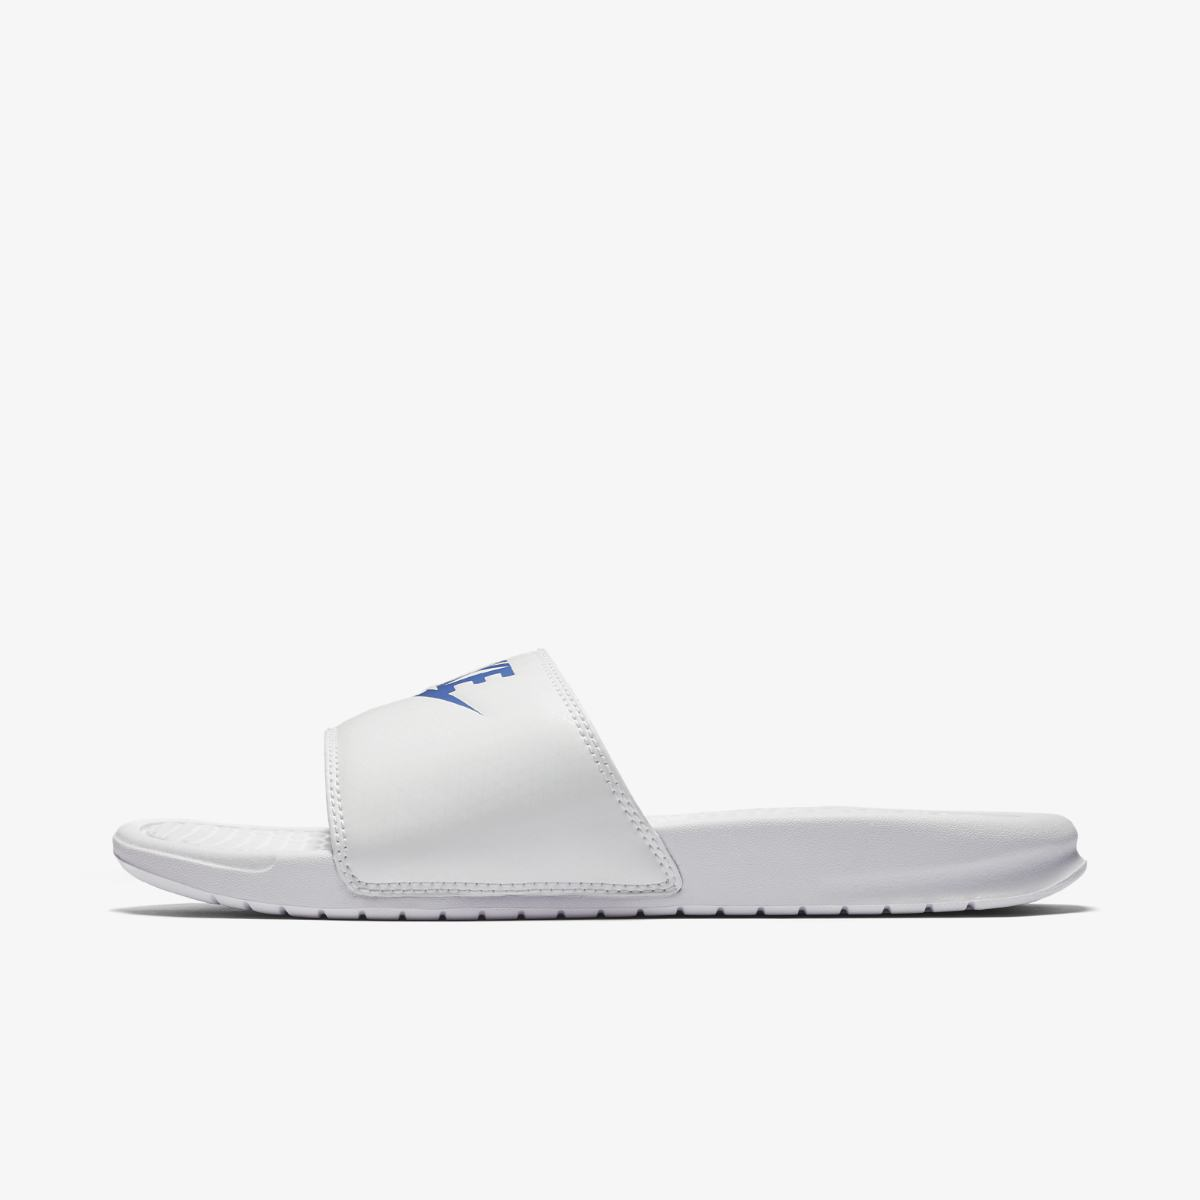 2e63a6b02 Тапочки Nike BENASSI JDI 343880-102 купить | deltasport.ua